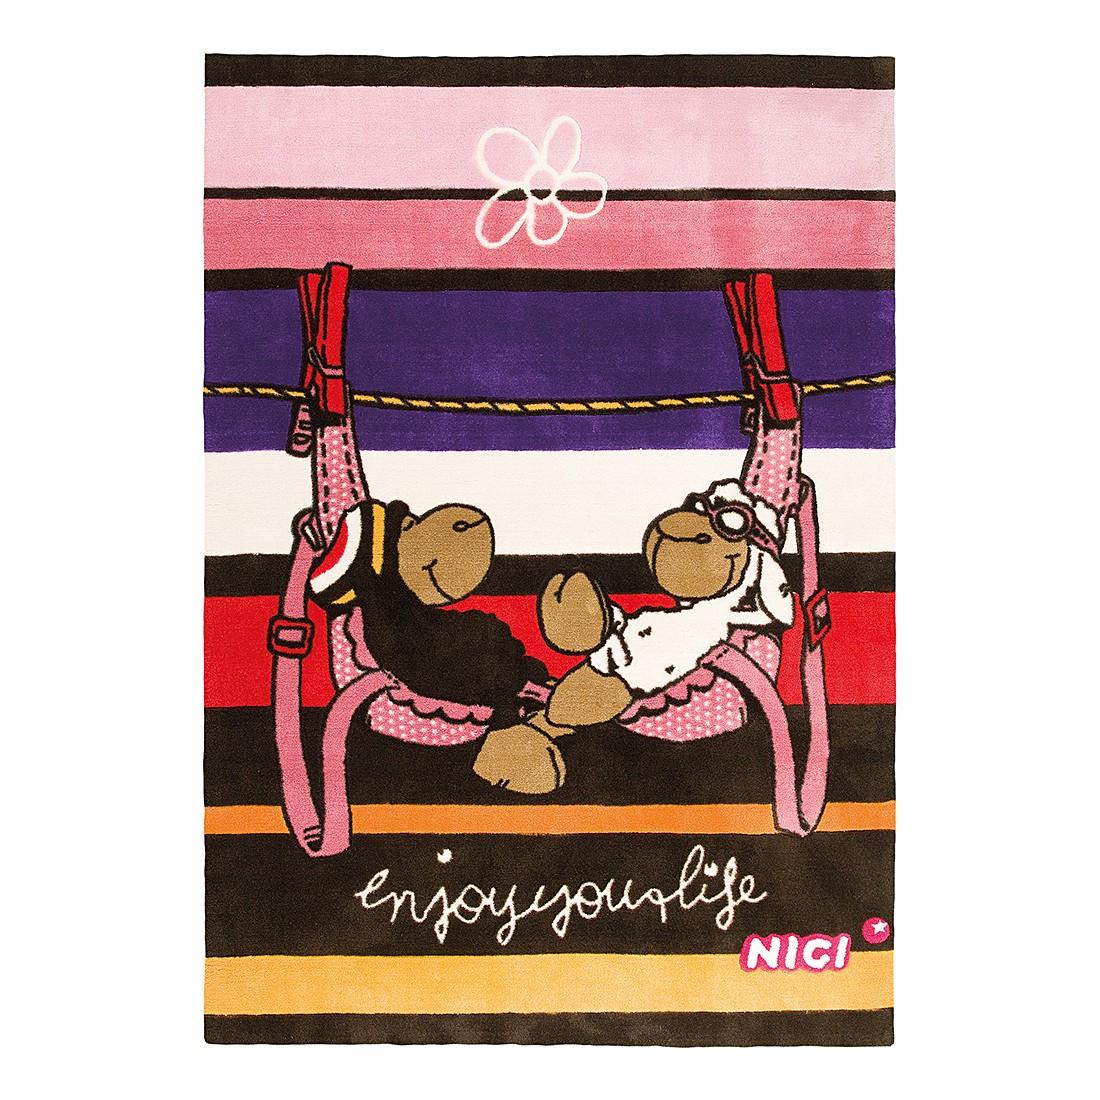 Teppich Jolly Bob & Lovely - Braun/Rosa, Nici